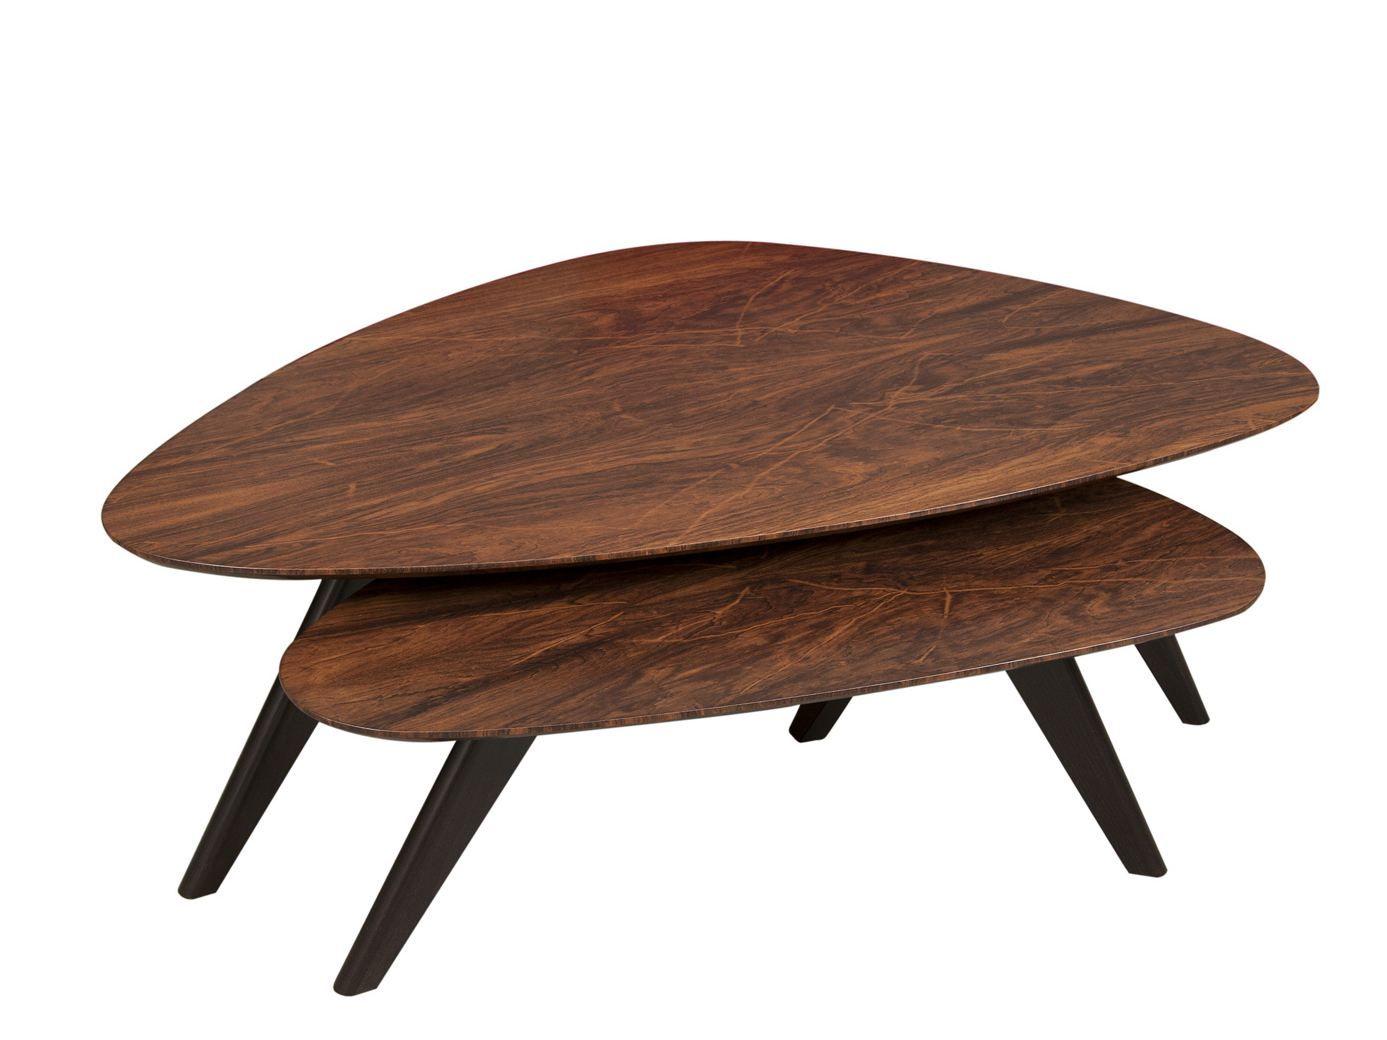 Lovely Triangular Wooden Coffee Table Jasper By Hamilton Conte Paris